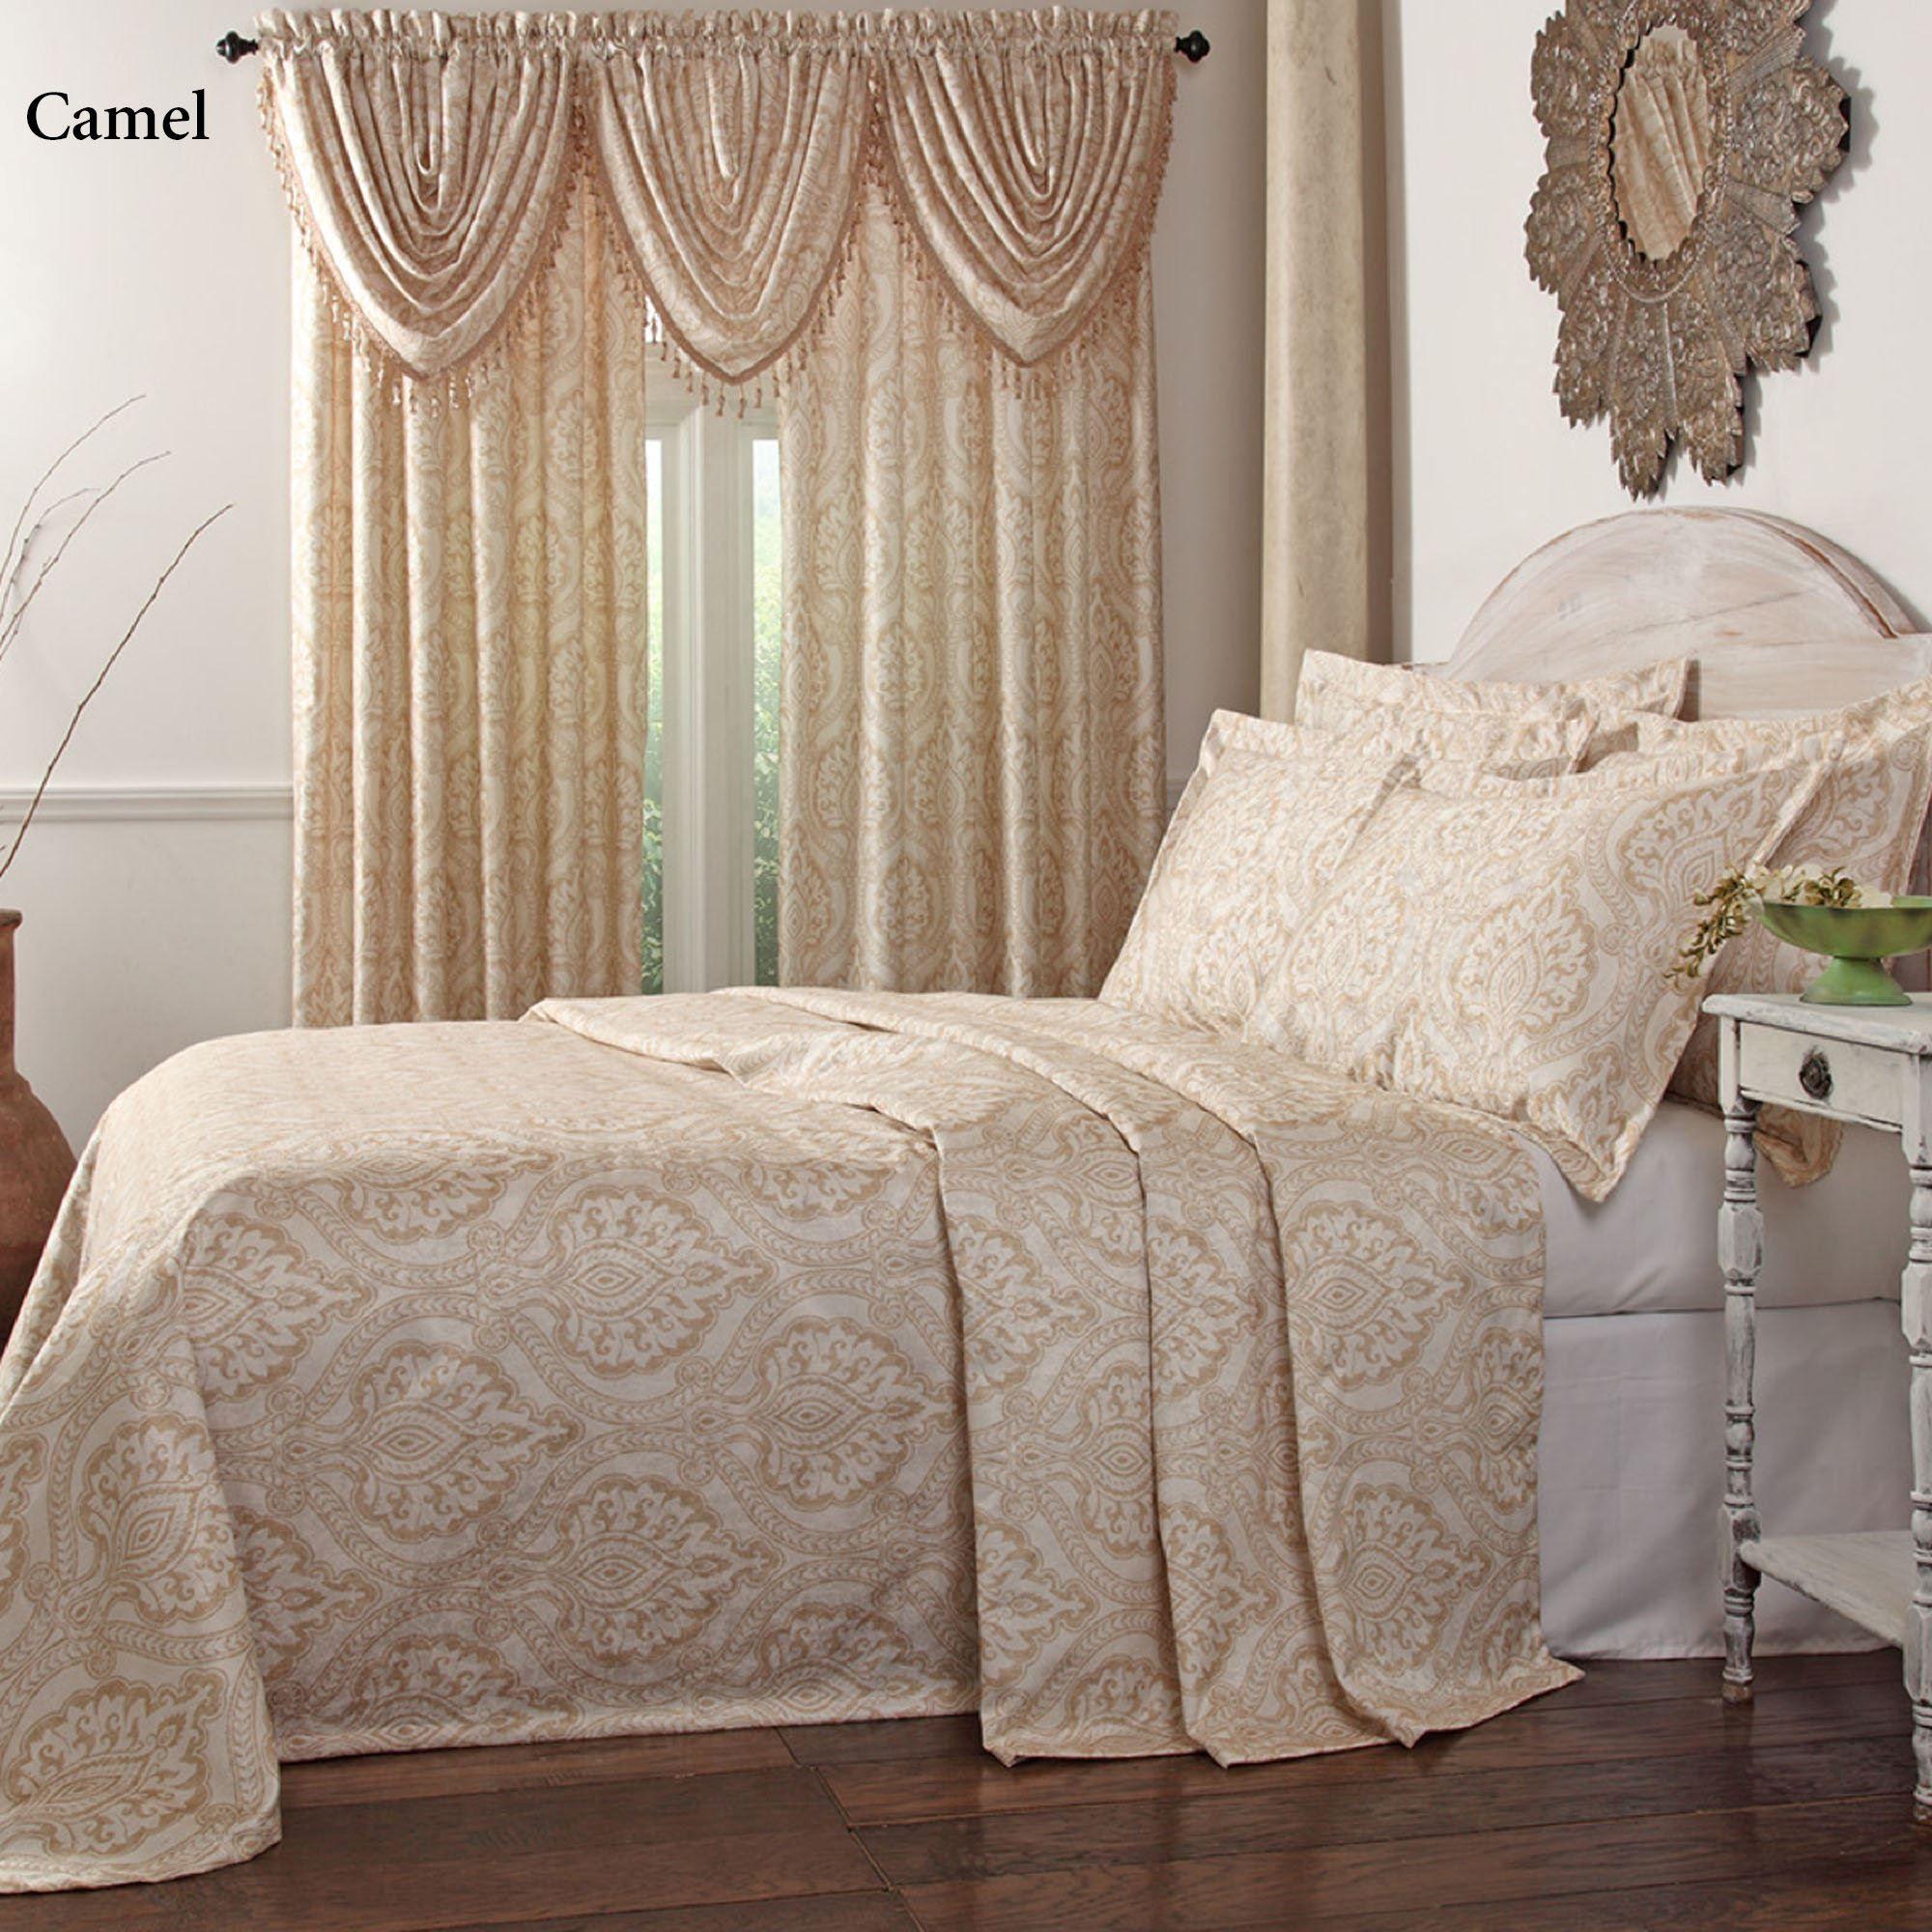 Santorini Lightweight Damask Bedspread Bedding